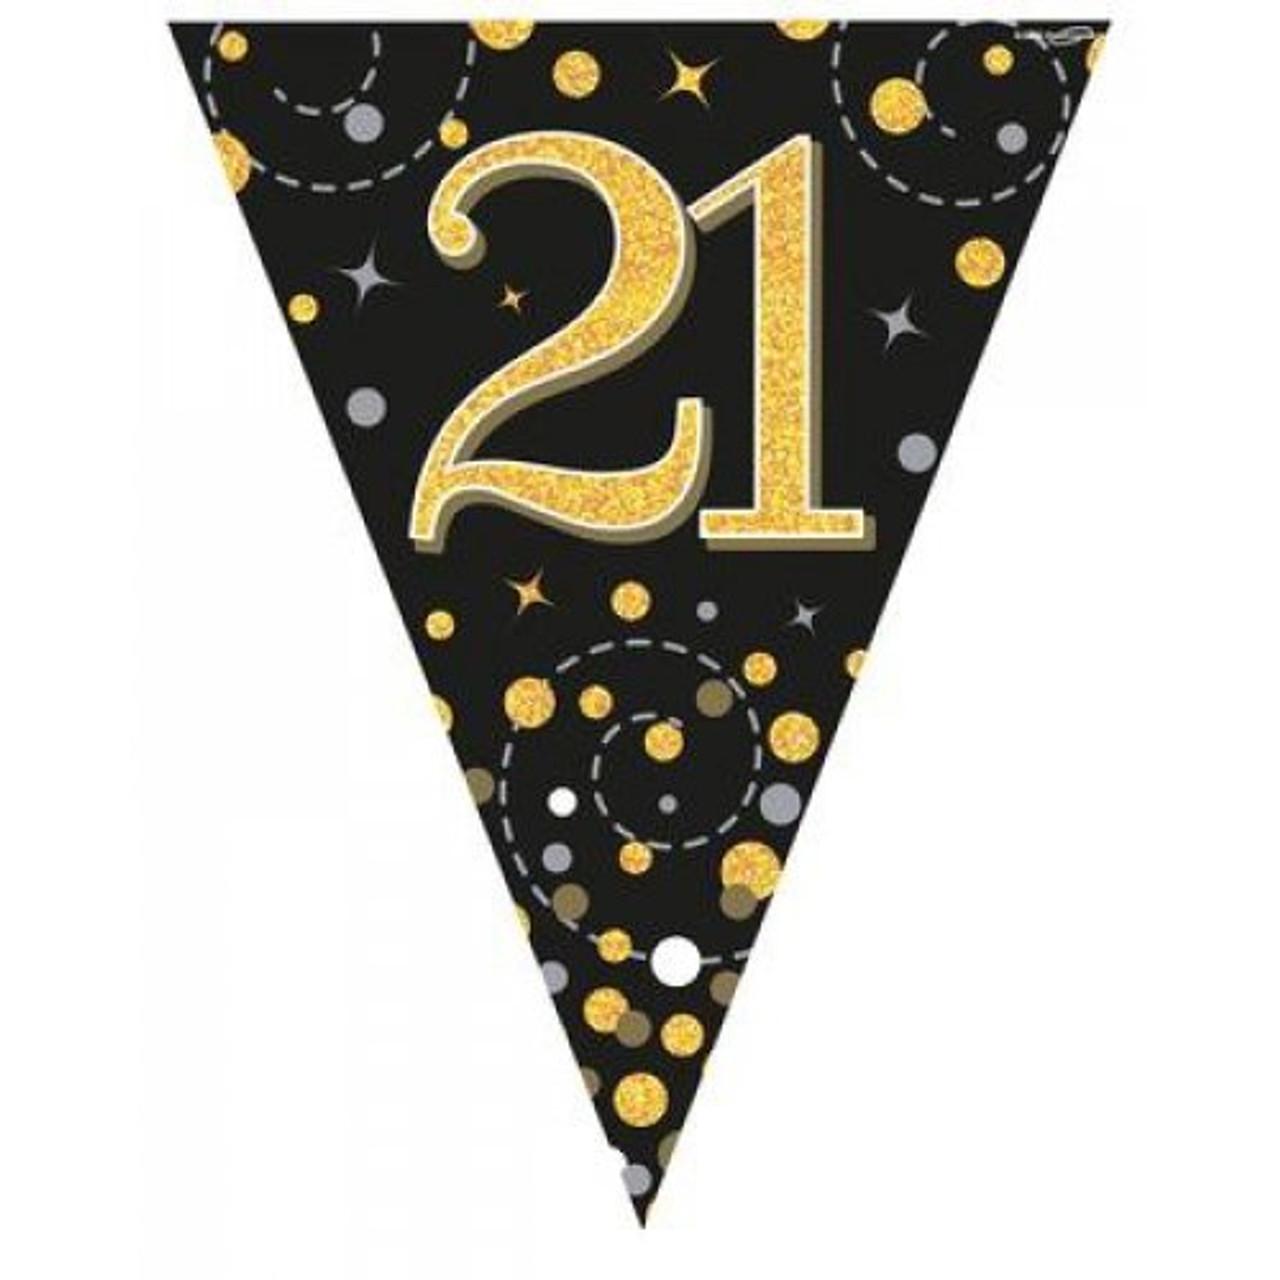 100 Best 21st Birthday Ideas - Ideas For Girls & Boys - Birthday Inspire